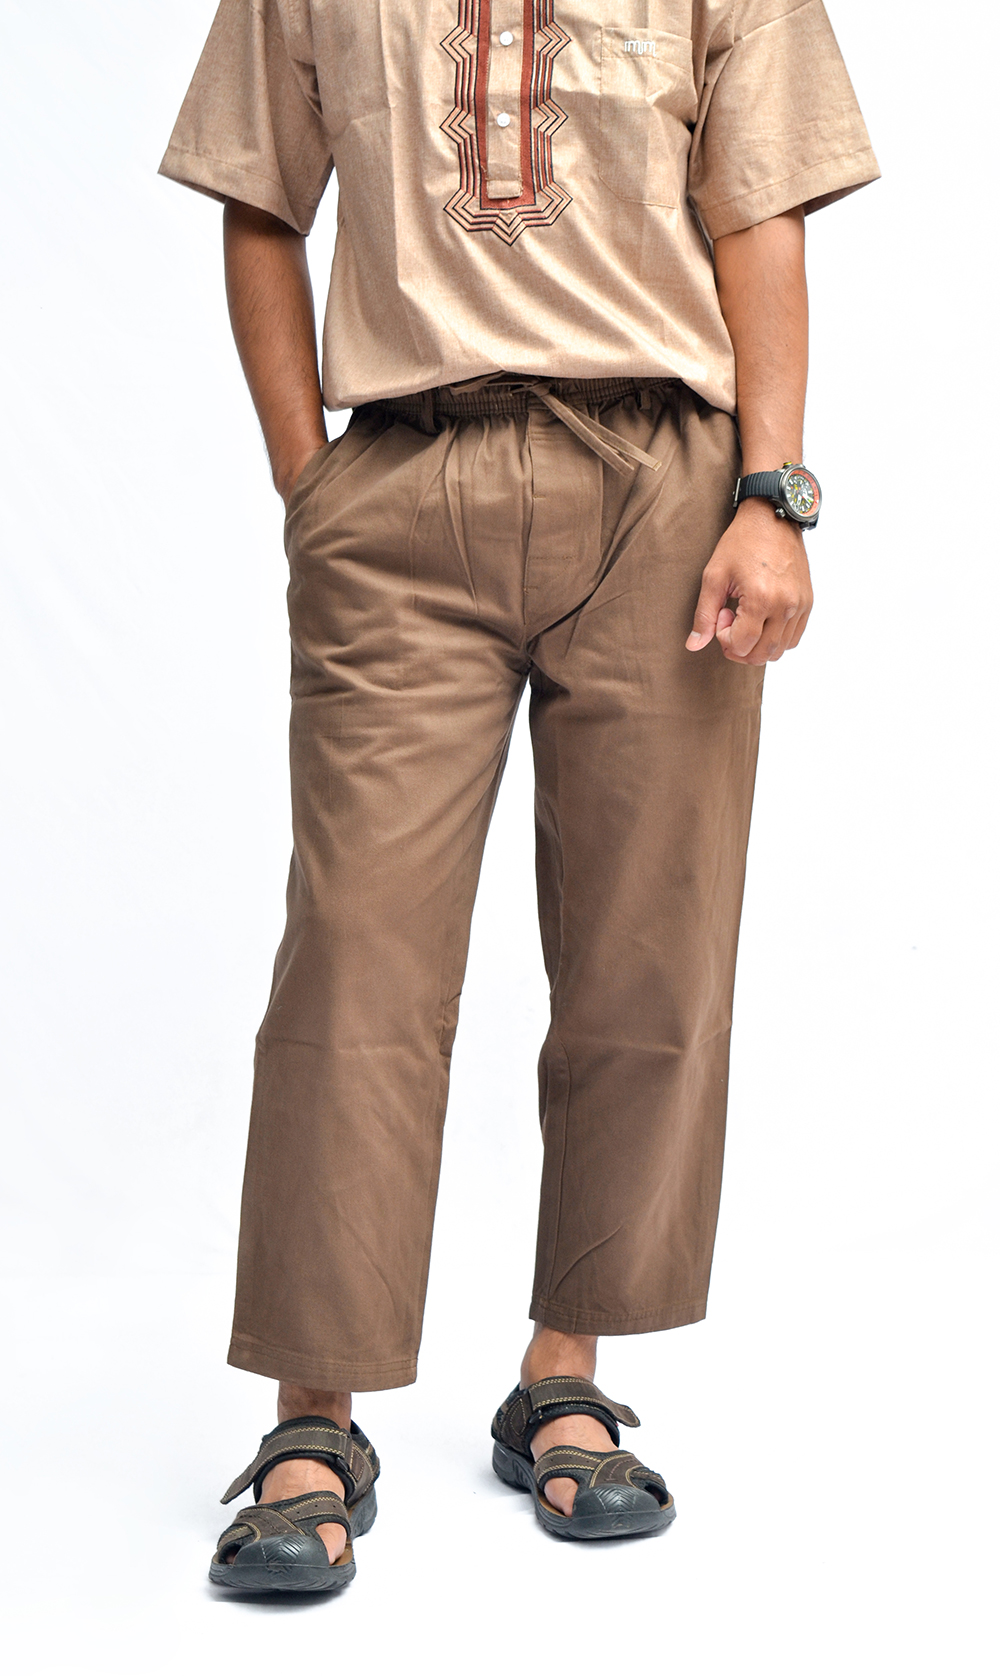 CS-007 Celana Sirwal Coklat